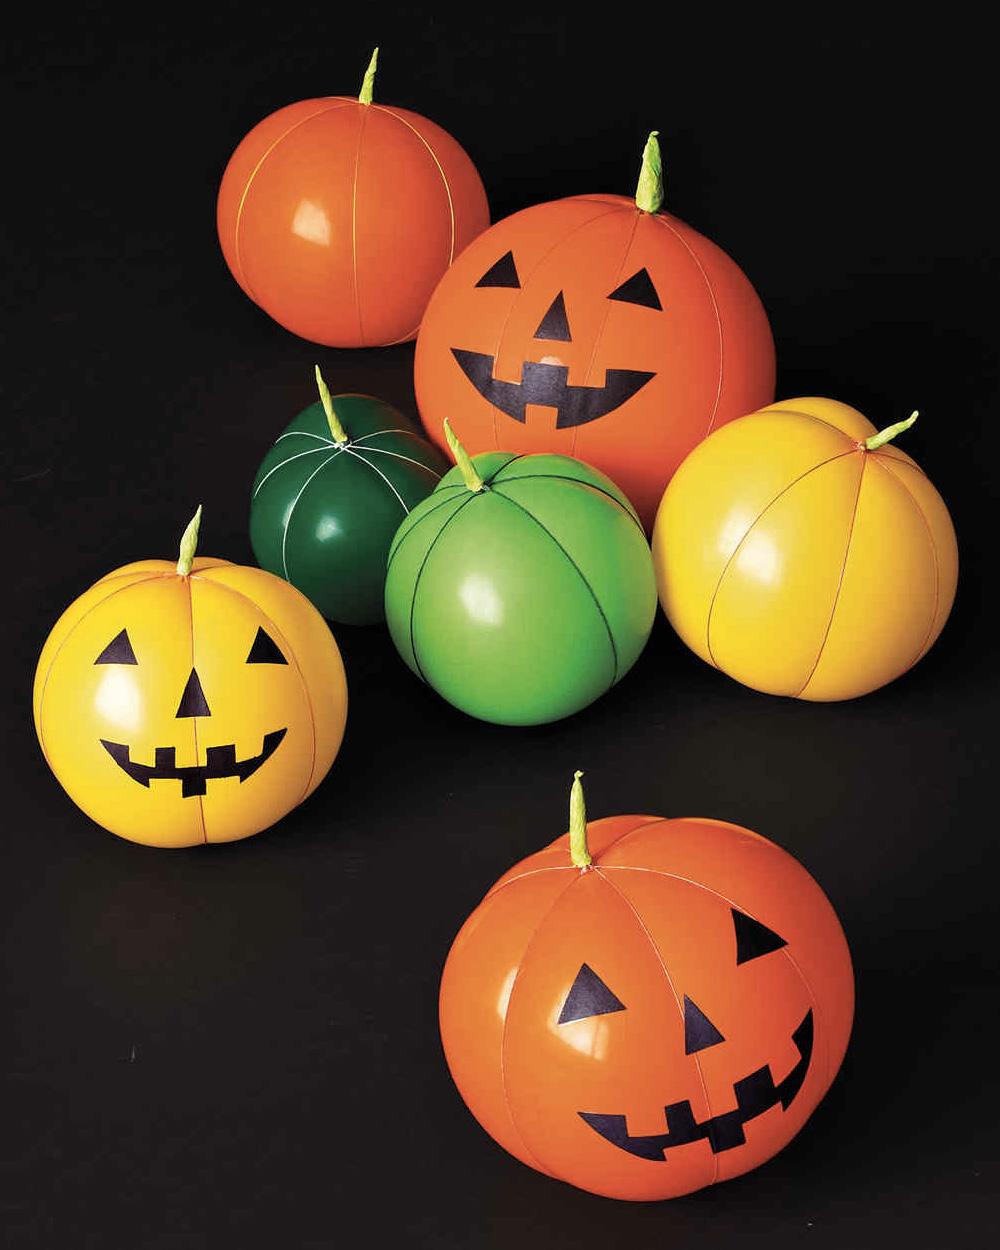 Décorer sa maison pour Halloween | Shake My Blog